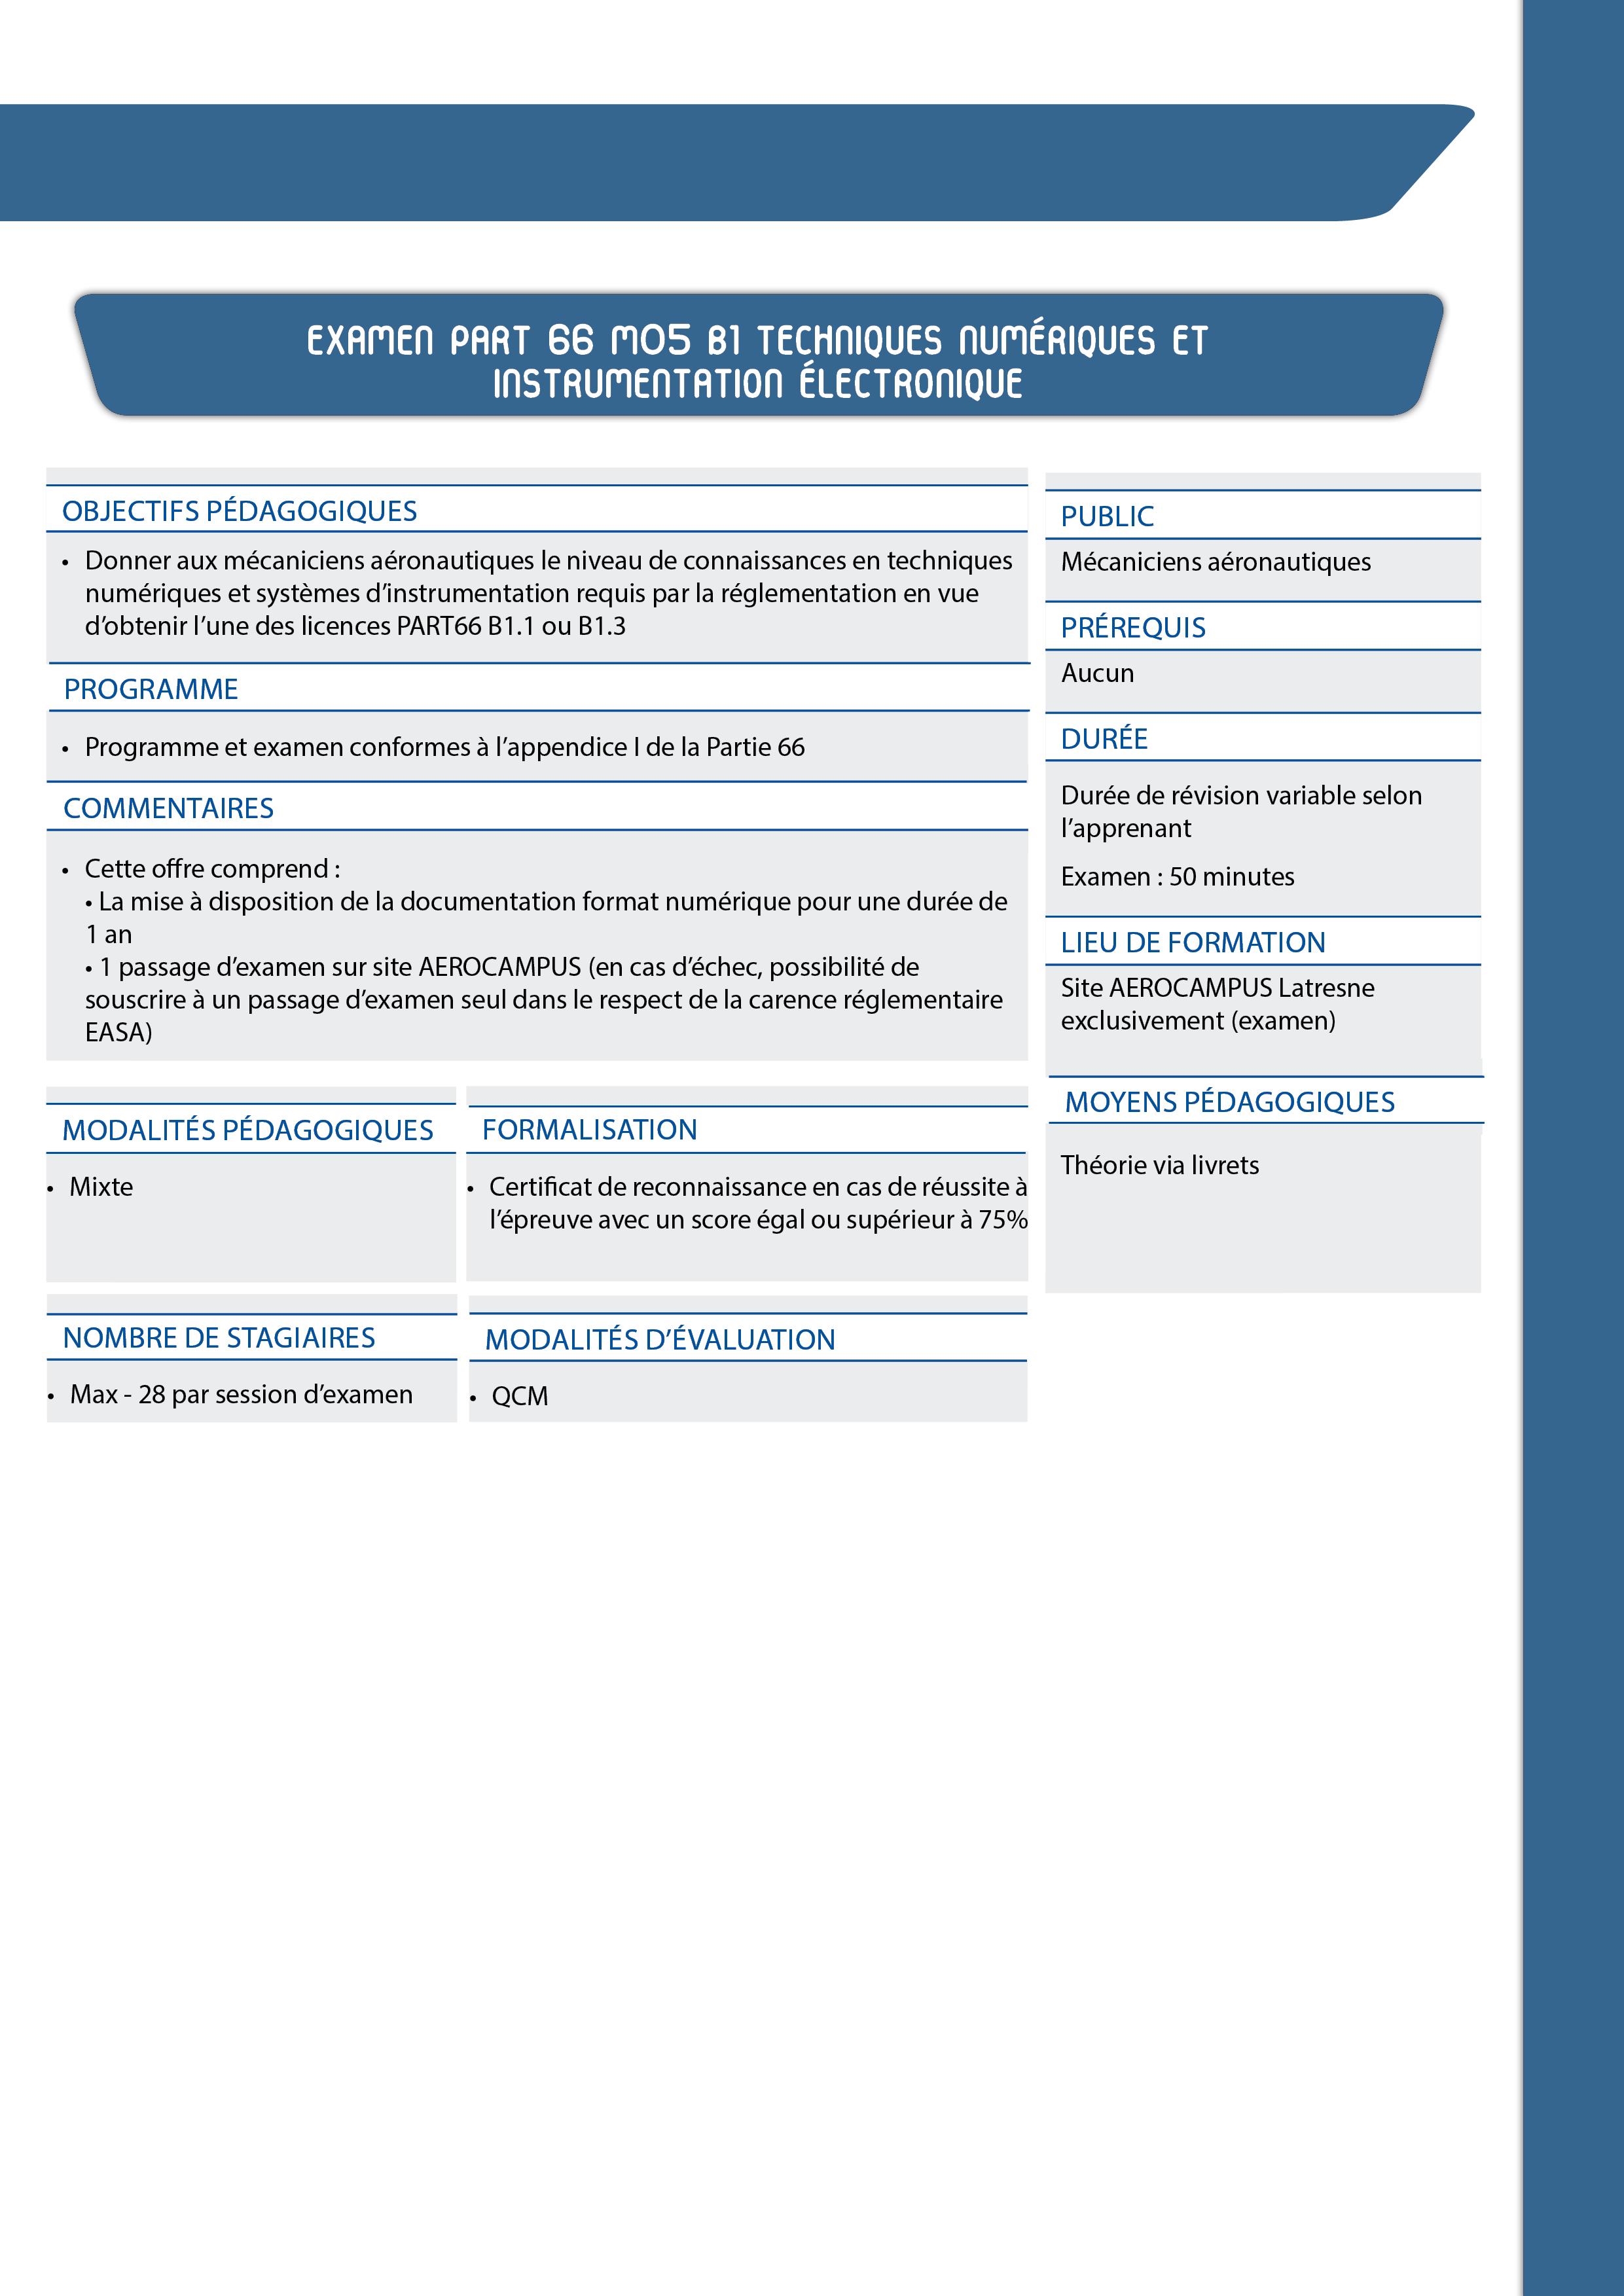 CATALOGUE FORMATIONS CONTINUES AEROCAMPUS_Ed2020_HD37